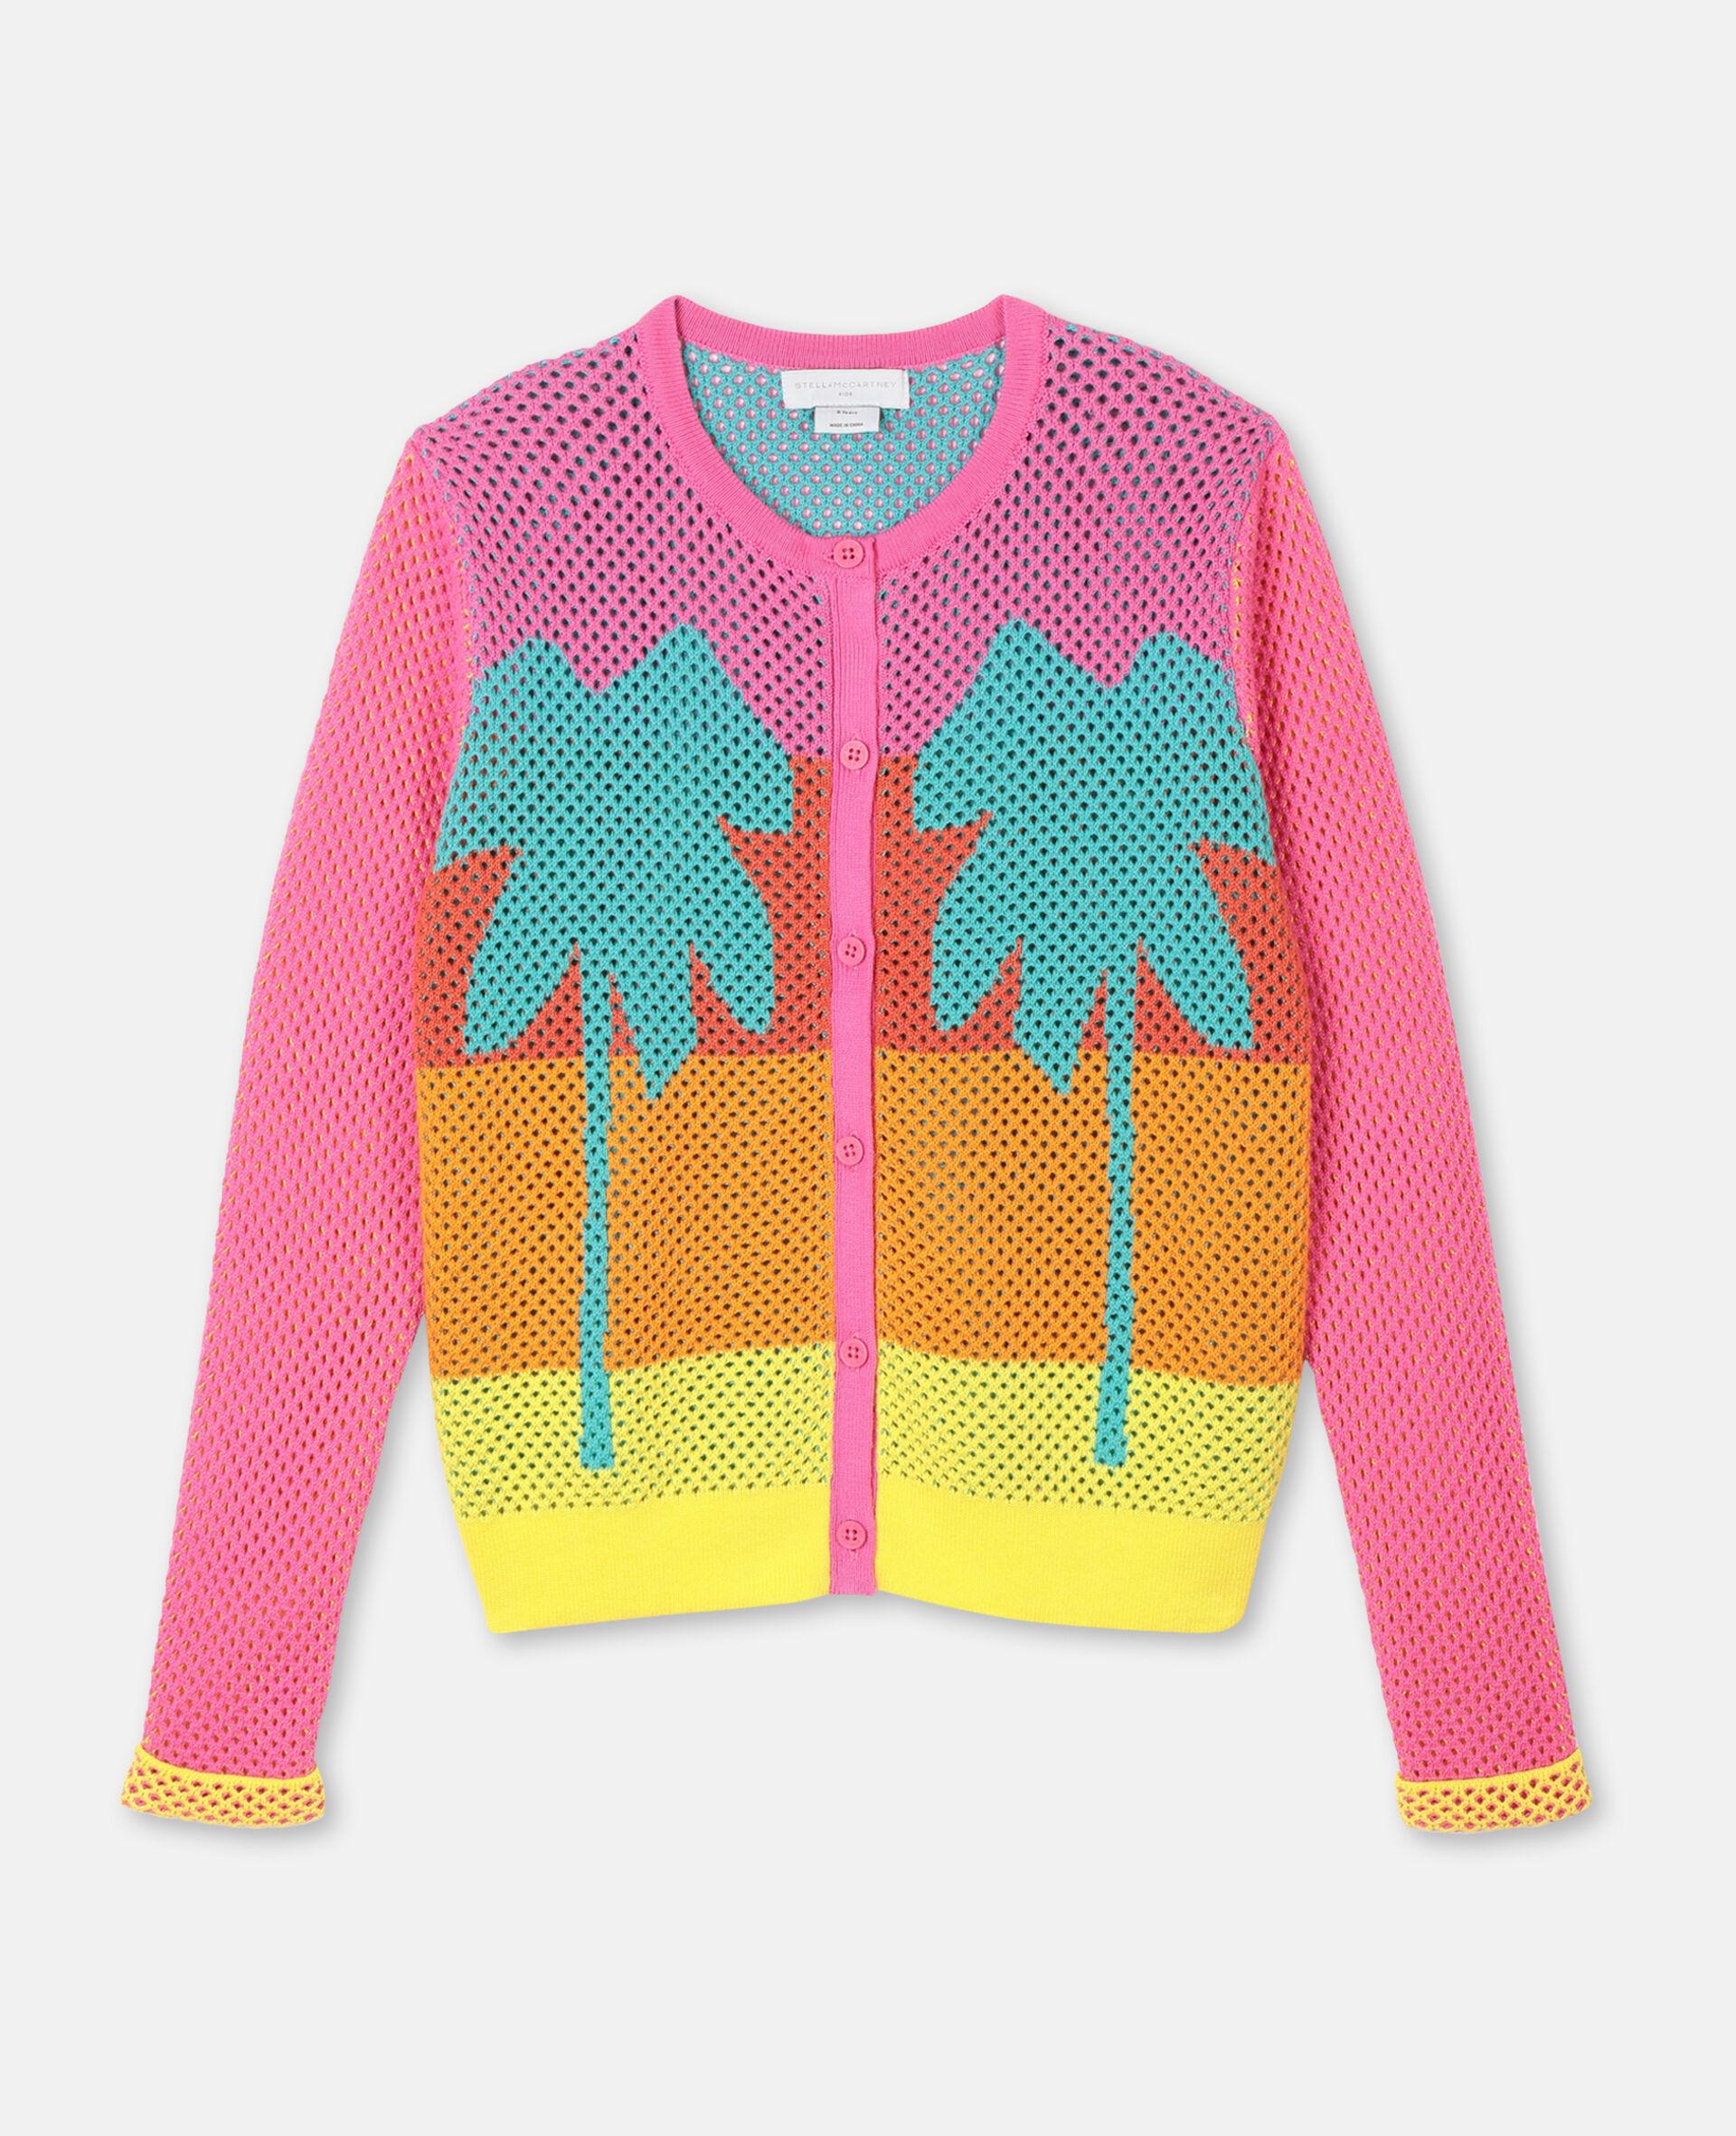 Intarsia Mesh Knit Cotton Cardigan-Multicoloured-large image number 0